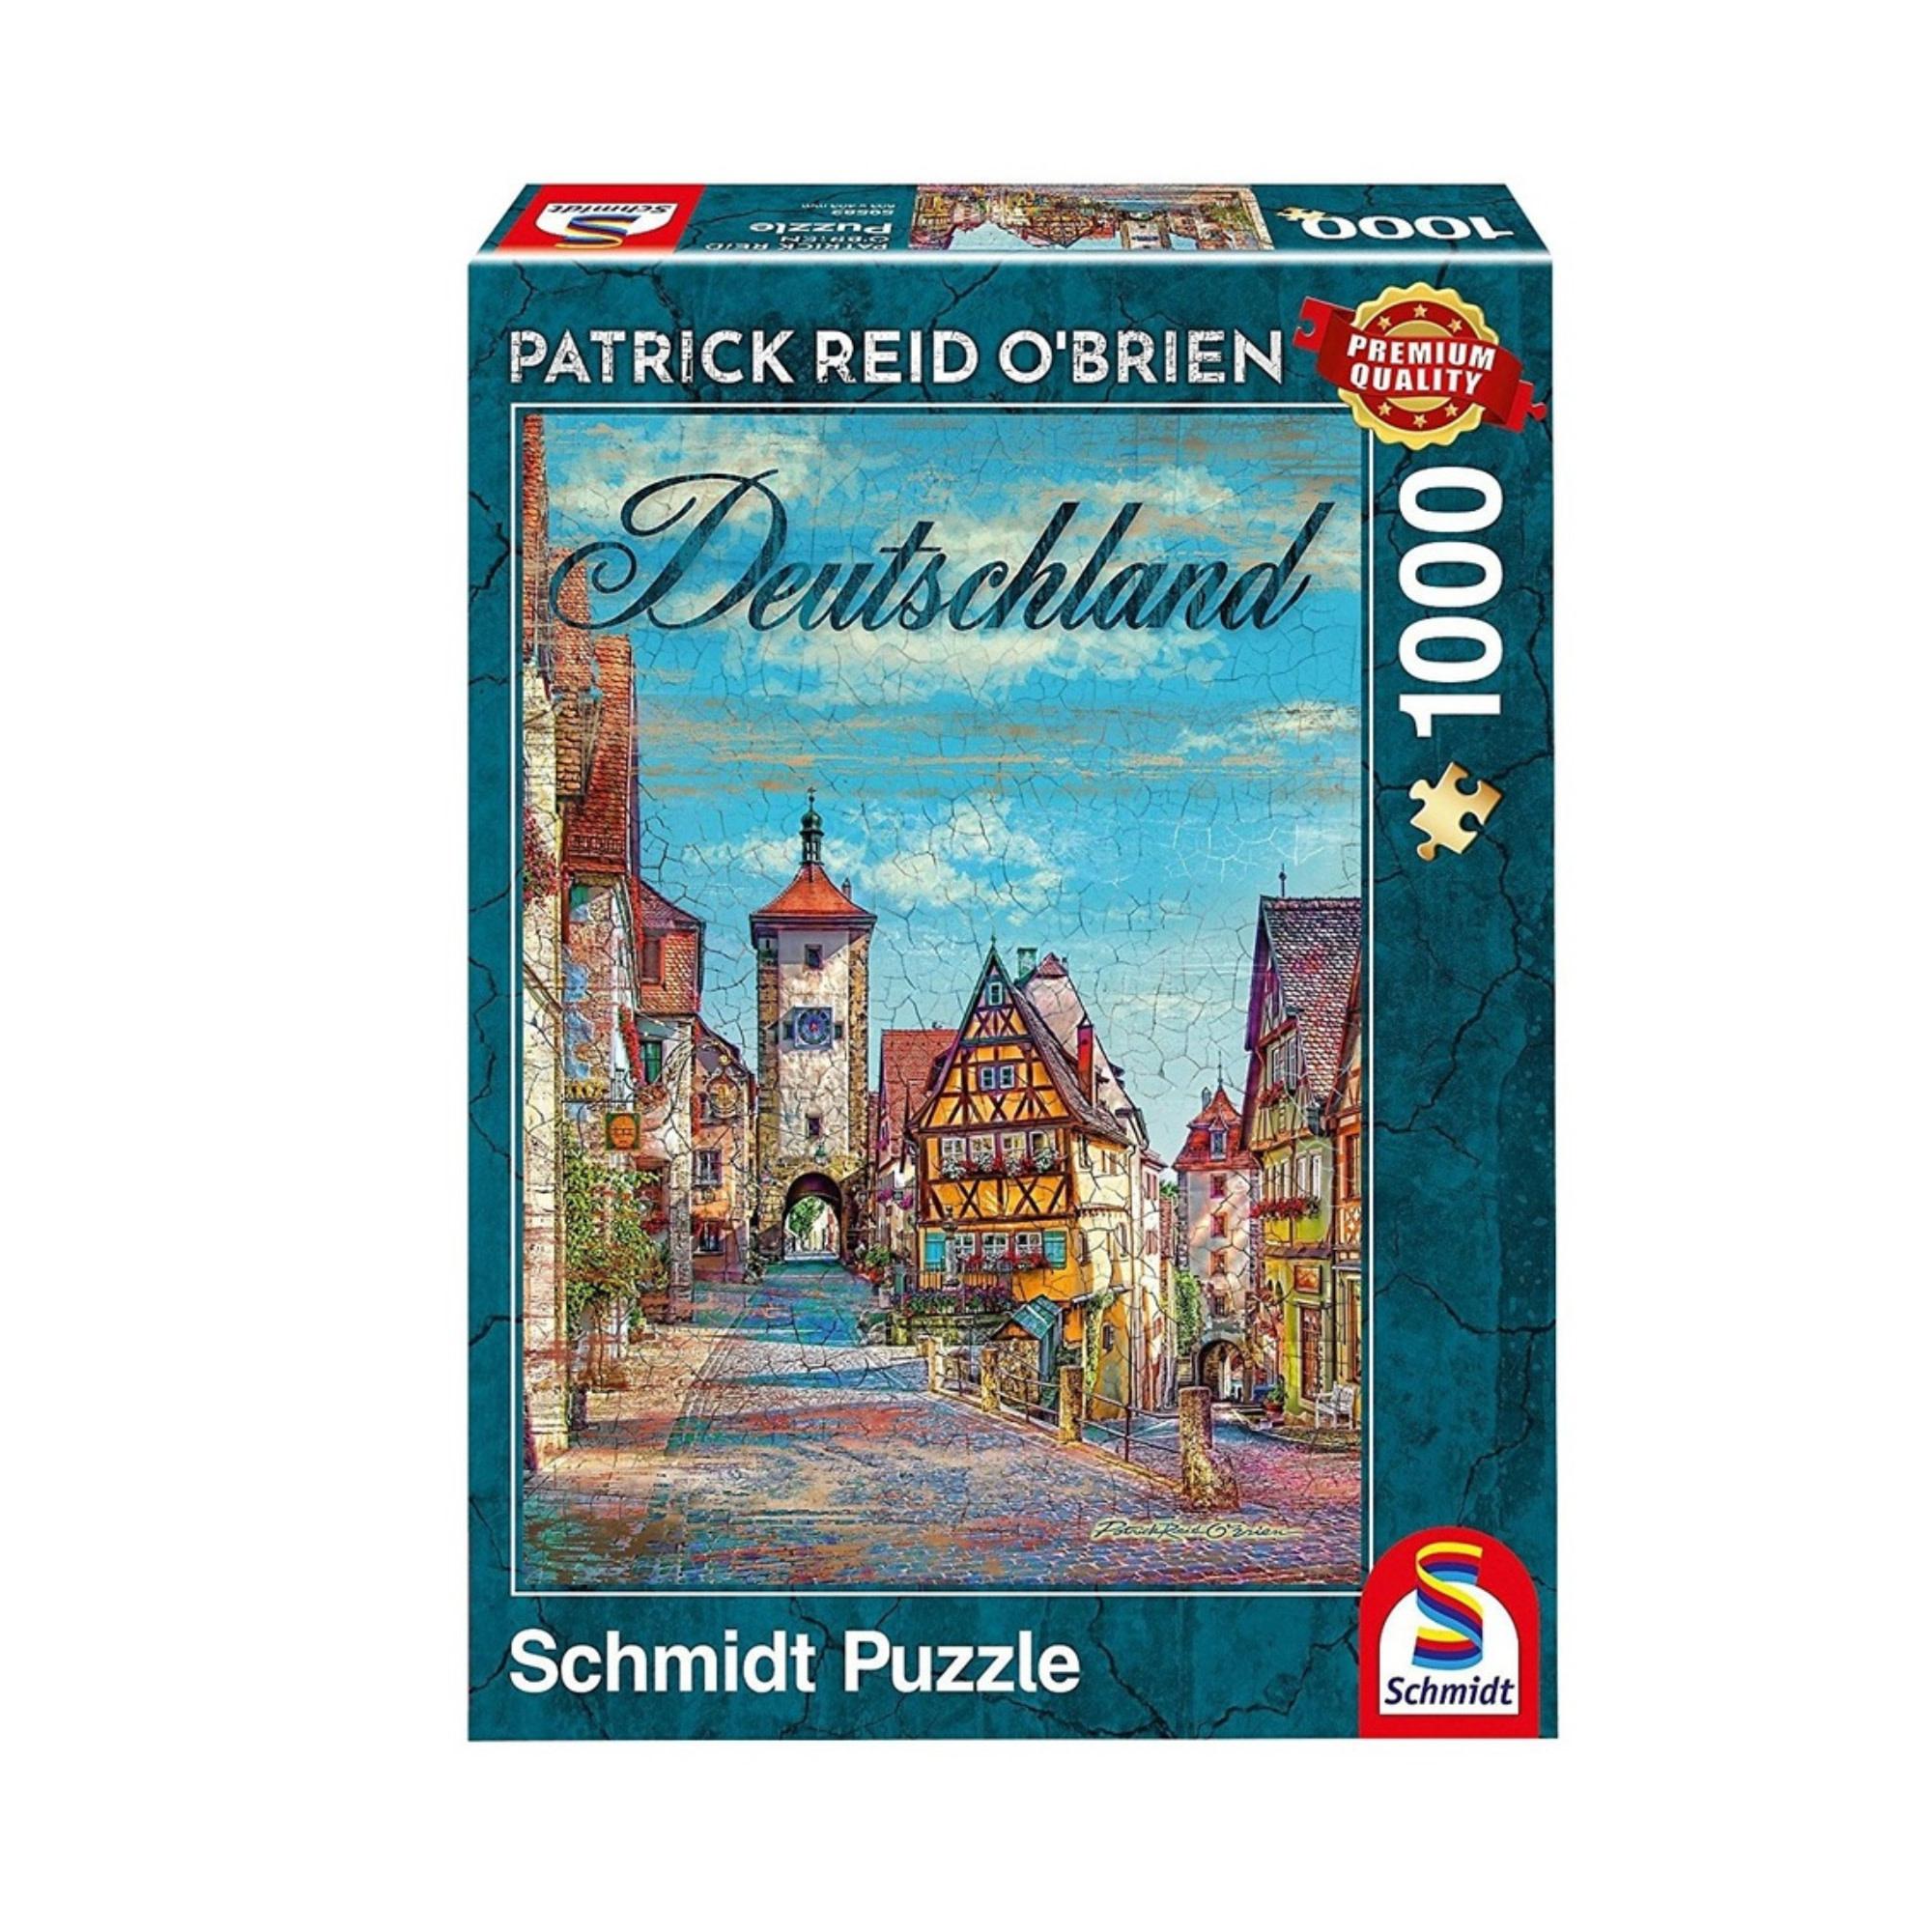 Schmidt Puzzle 1000: Germany